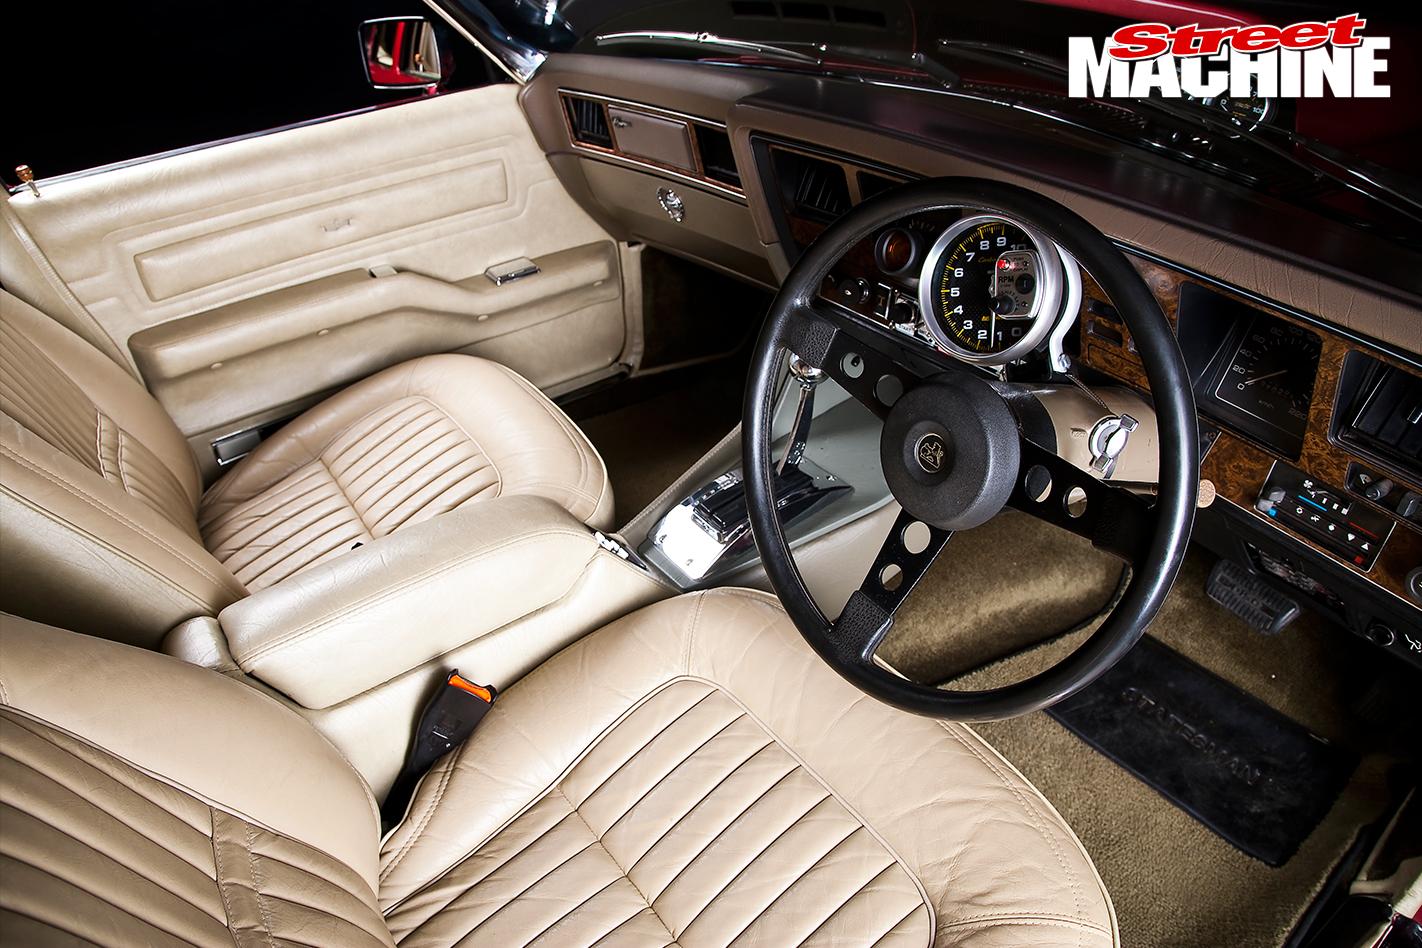 Holden -HJ-Statesman -interior -front